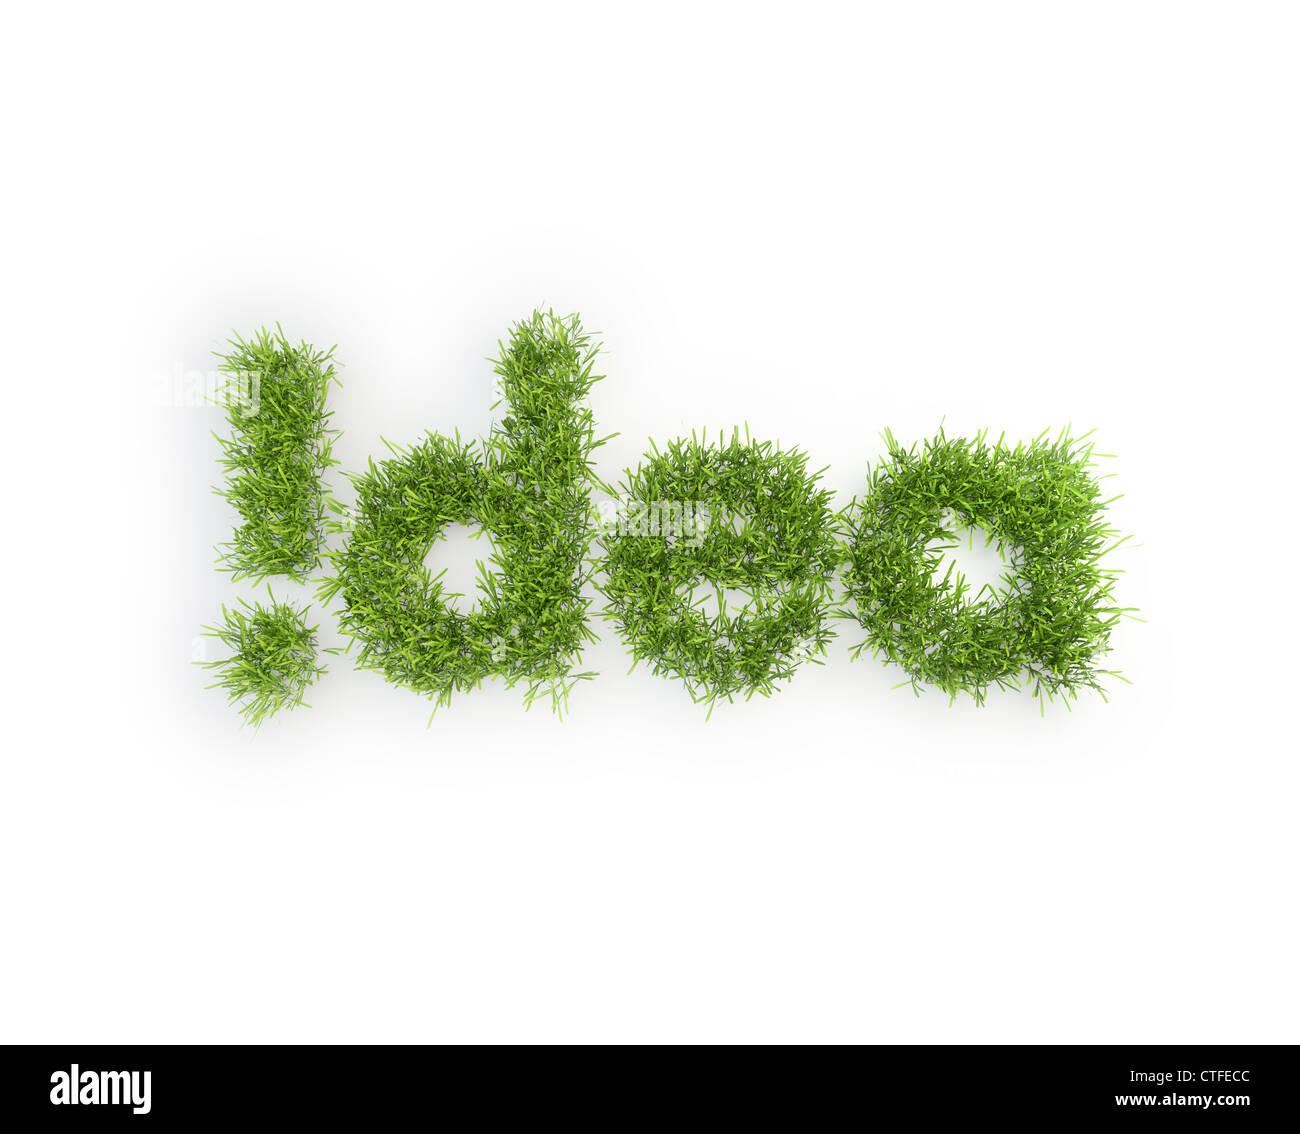 Idee Grass Patch - Kreativität-Konzept Stockfoto